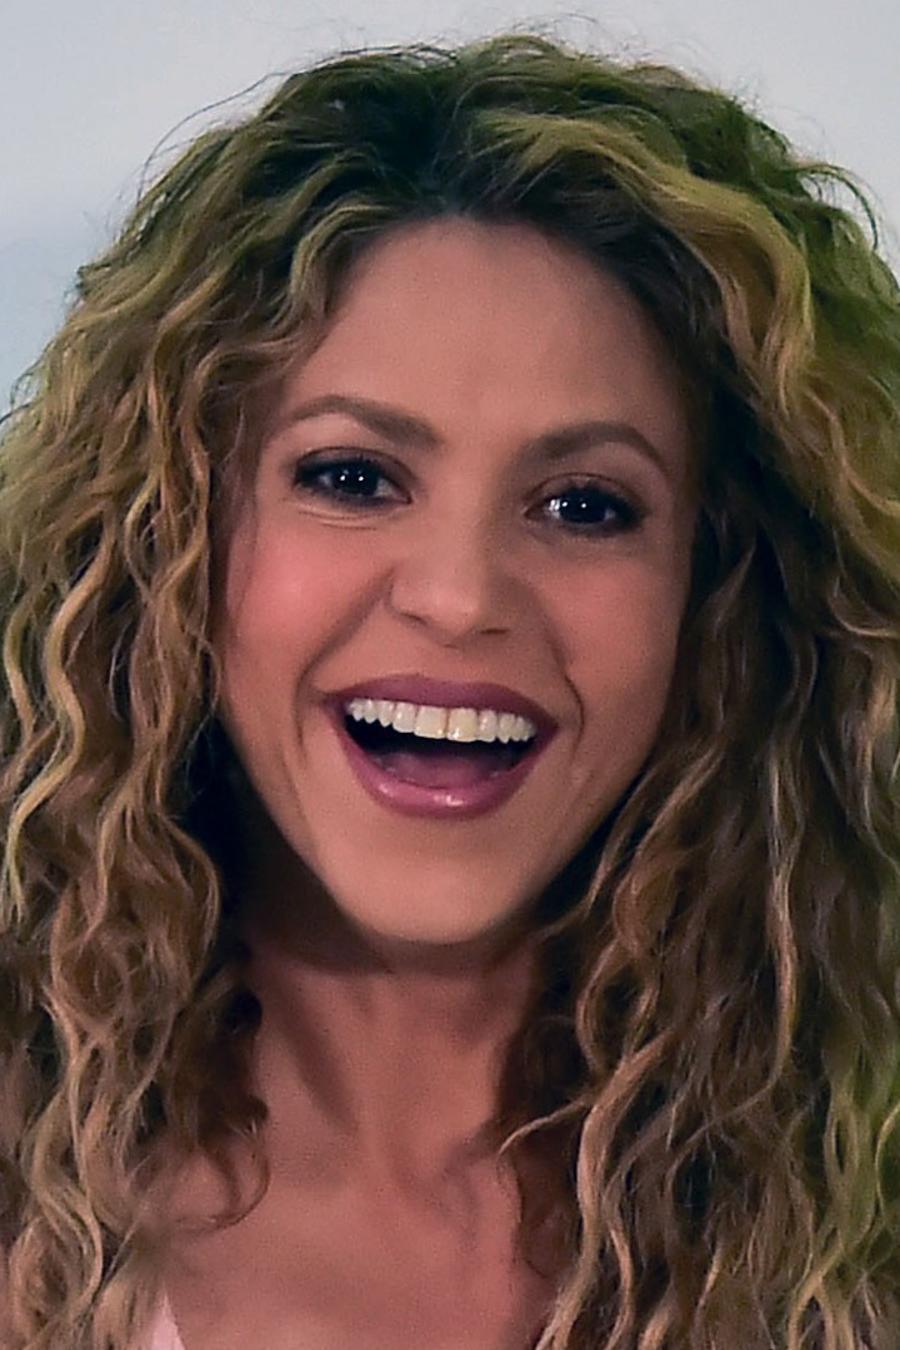 Shakira smiles and waves